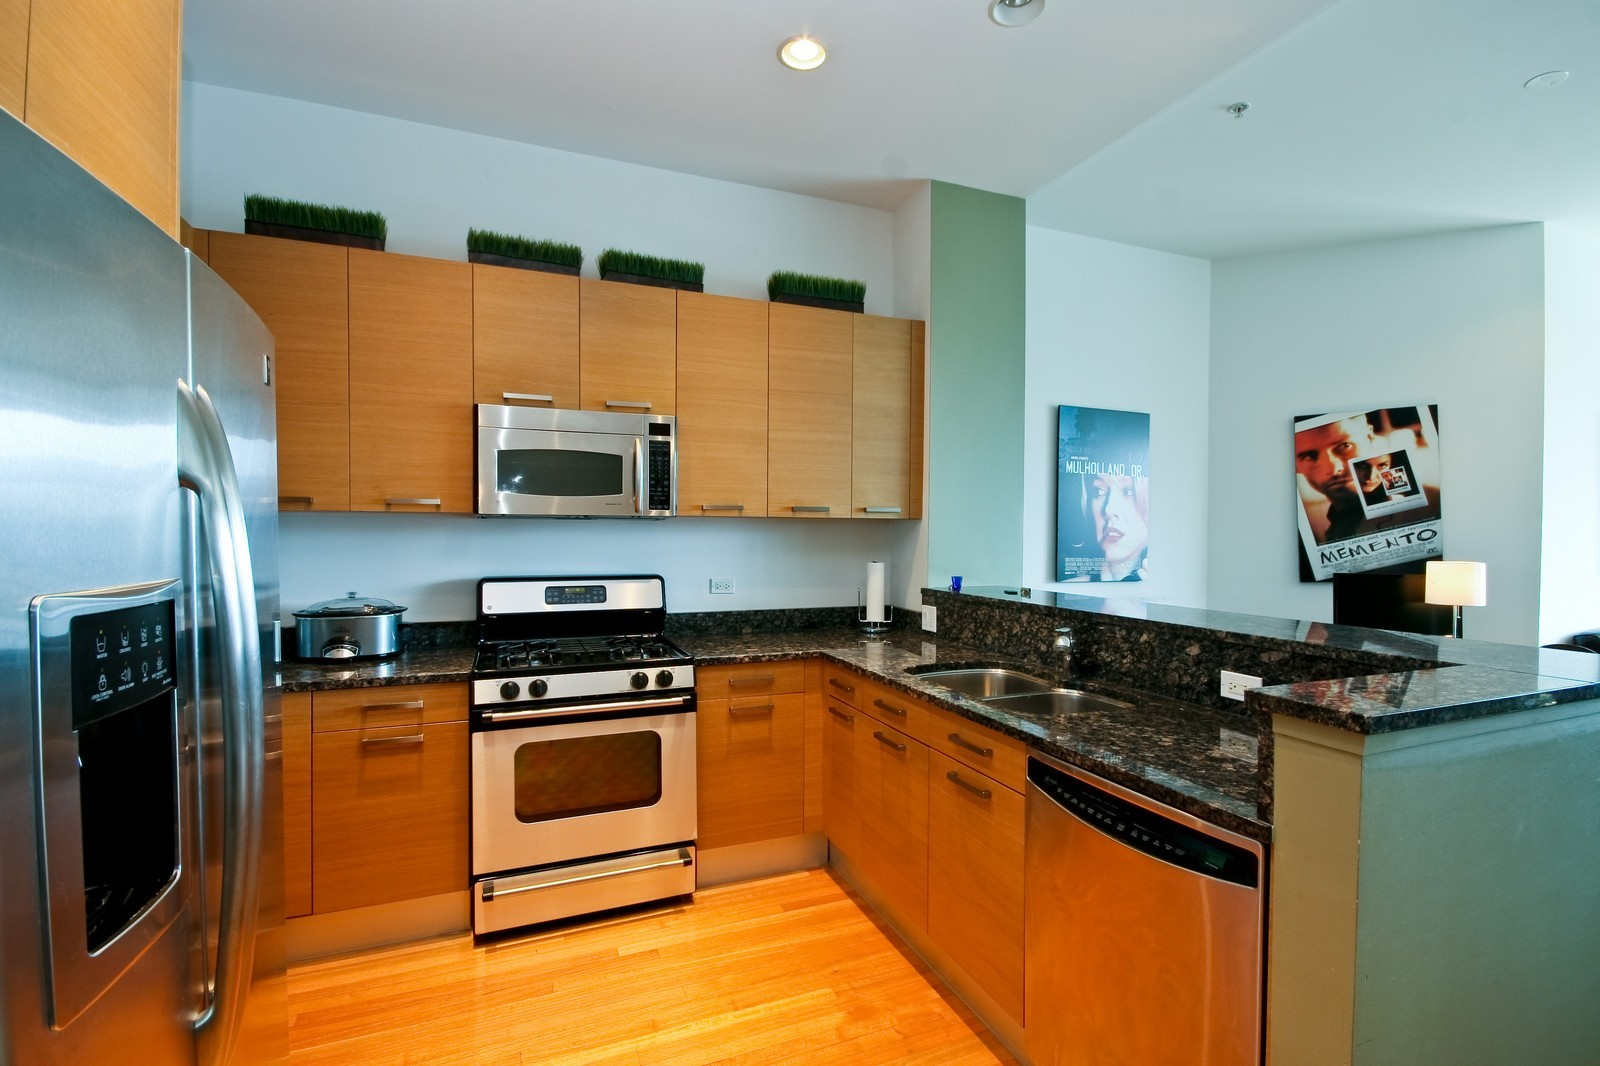 Real Estate Photography - 500 W Superior, Unit 1713, Chicago, IL, 60654 - Kitchen